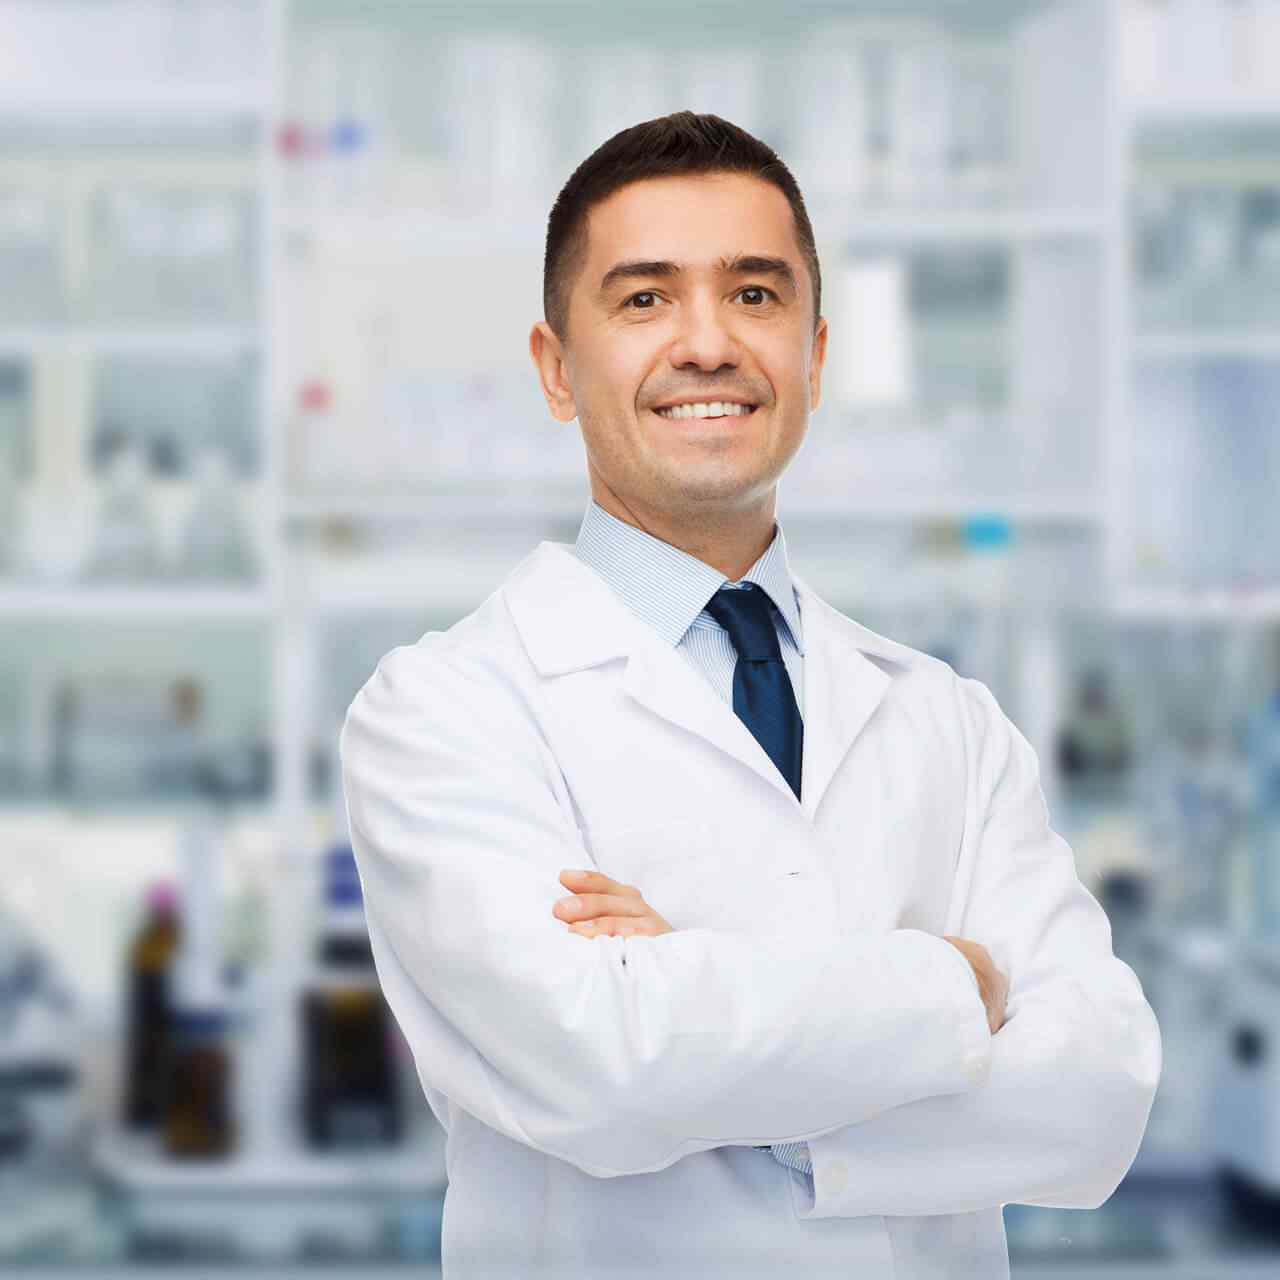 https://www.ellegimedical.it/wp-content/uploads/2020/04/about-me-03.jpg